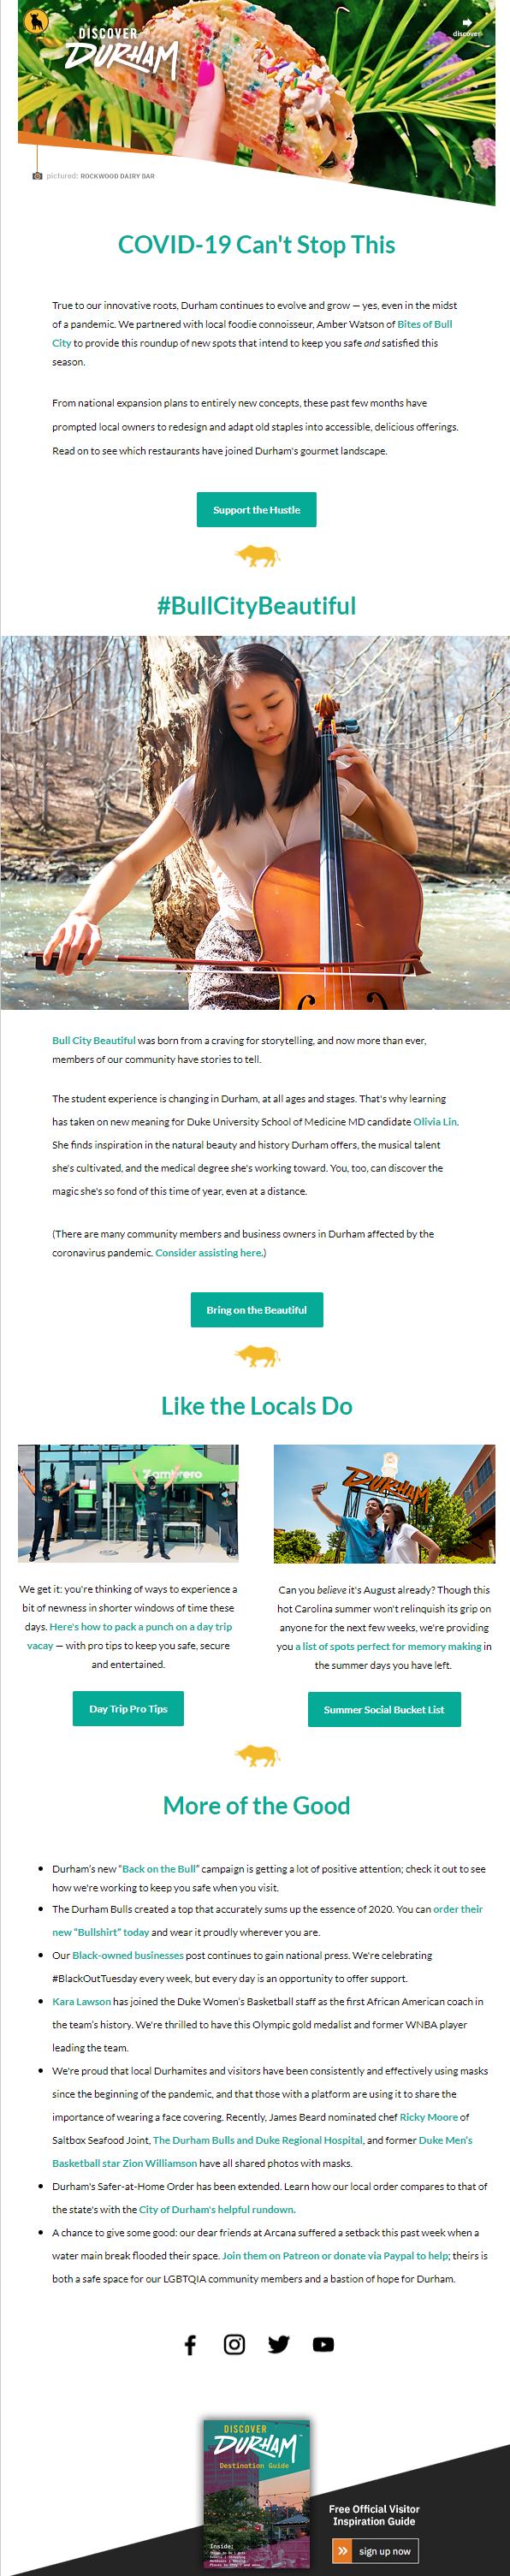 The redesigned flagship e-newsletter